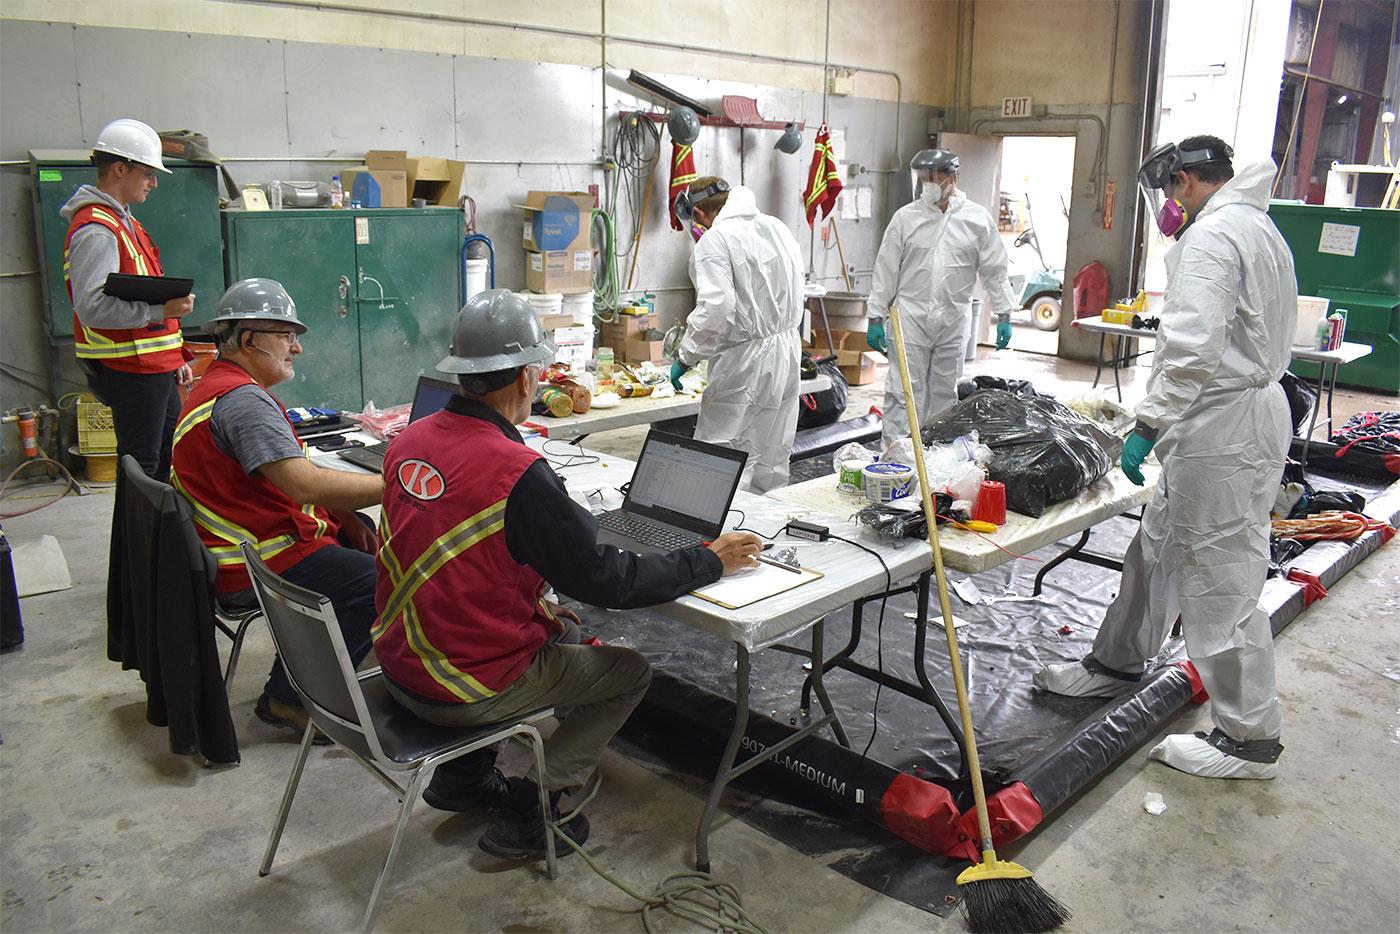 waste-audit-edmonton-western-canada